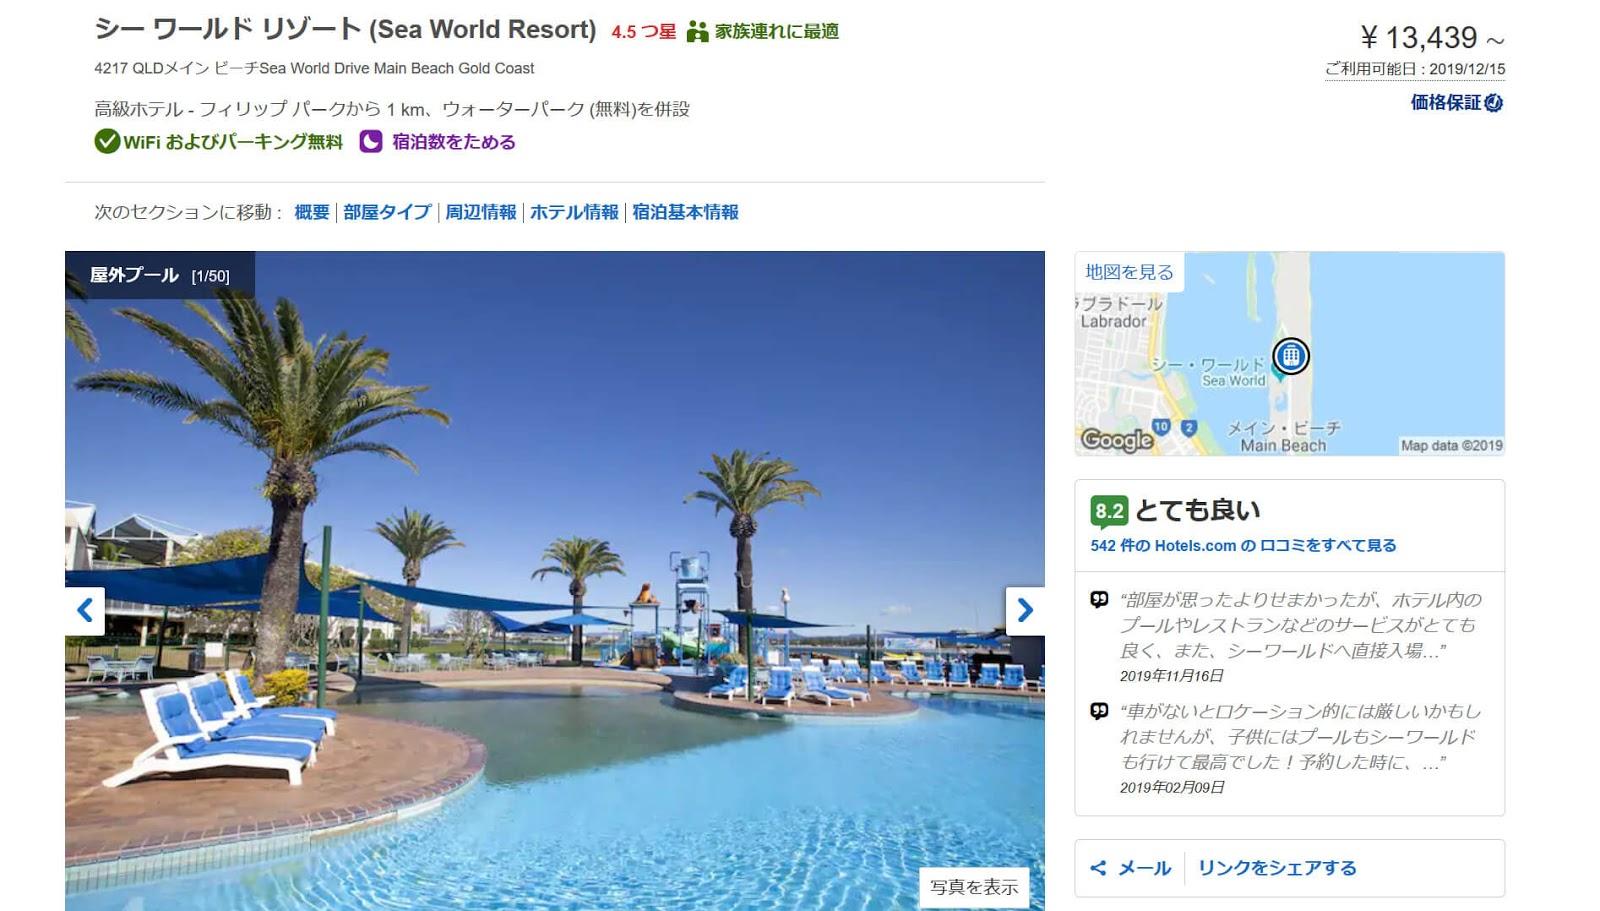 http://www.dpbolvw.net/r365cy63y5LVMMTVUNLNNPOTTQP?url=https%3A%2F%2Fjp.hotels.com%2Fho136812%2F%3Fpa%3D3%26tab%3Ddescription%26q-room-0-adults%3D2%26intlid%3DSoldOutListing%26ZSX%3D0%26SYE%3D3%26q-room-0-children%3D0